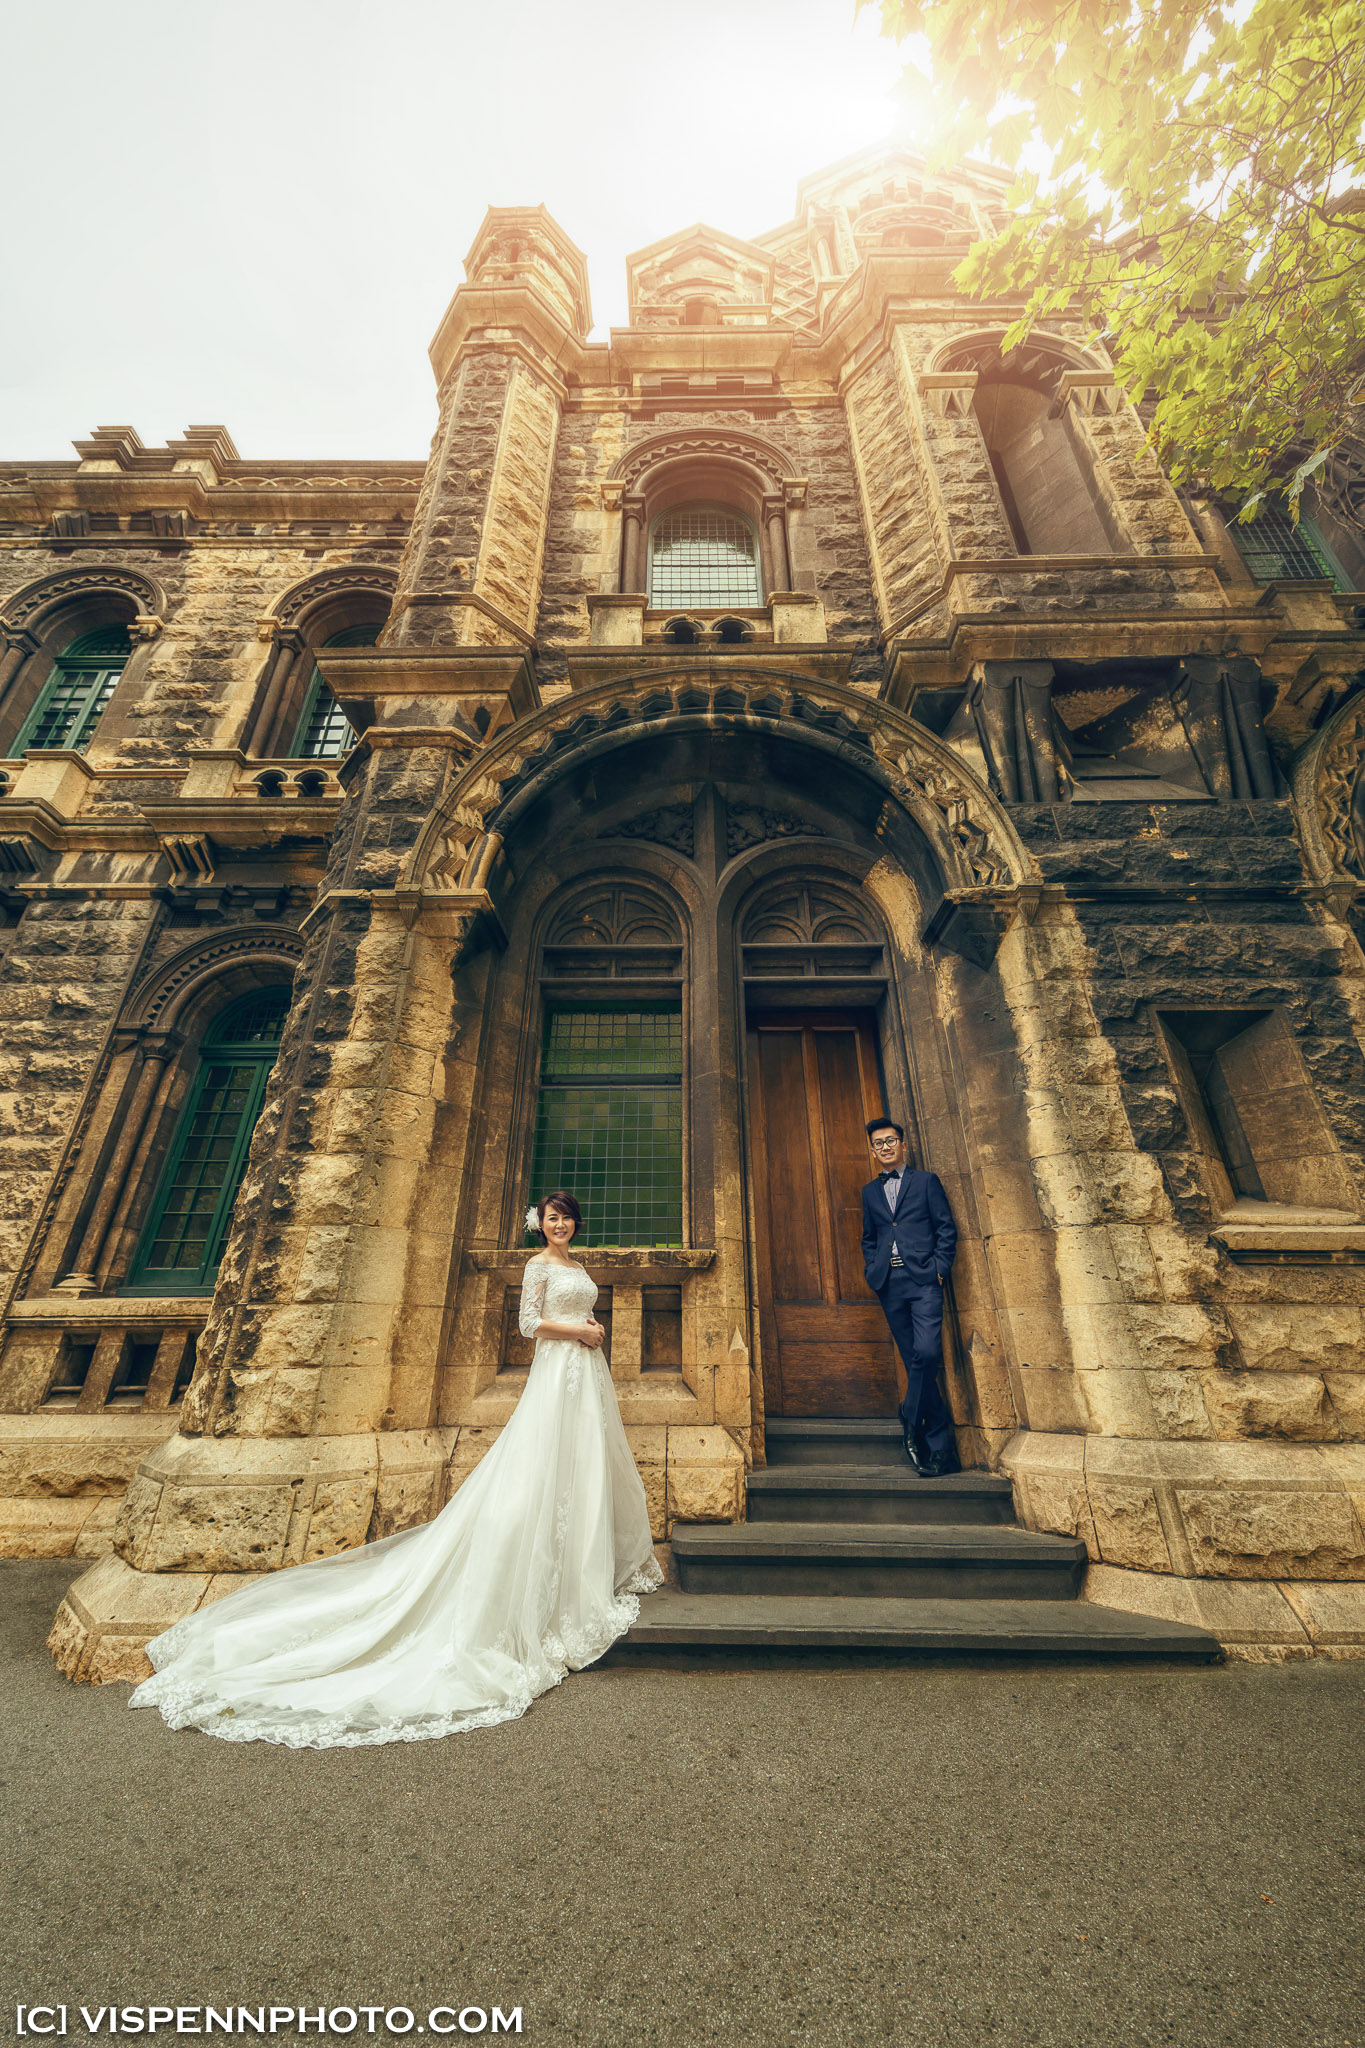 PRE WEDDING Photography Melbourne VISPENN 墨尔本 婚纱照 结婚照 婚纱摄影 VISPENN DaisyDanChenPreWedding 1515 1